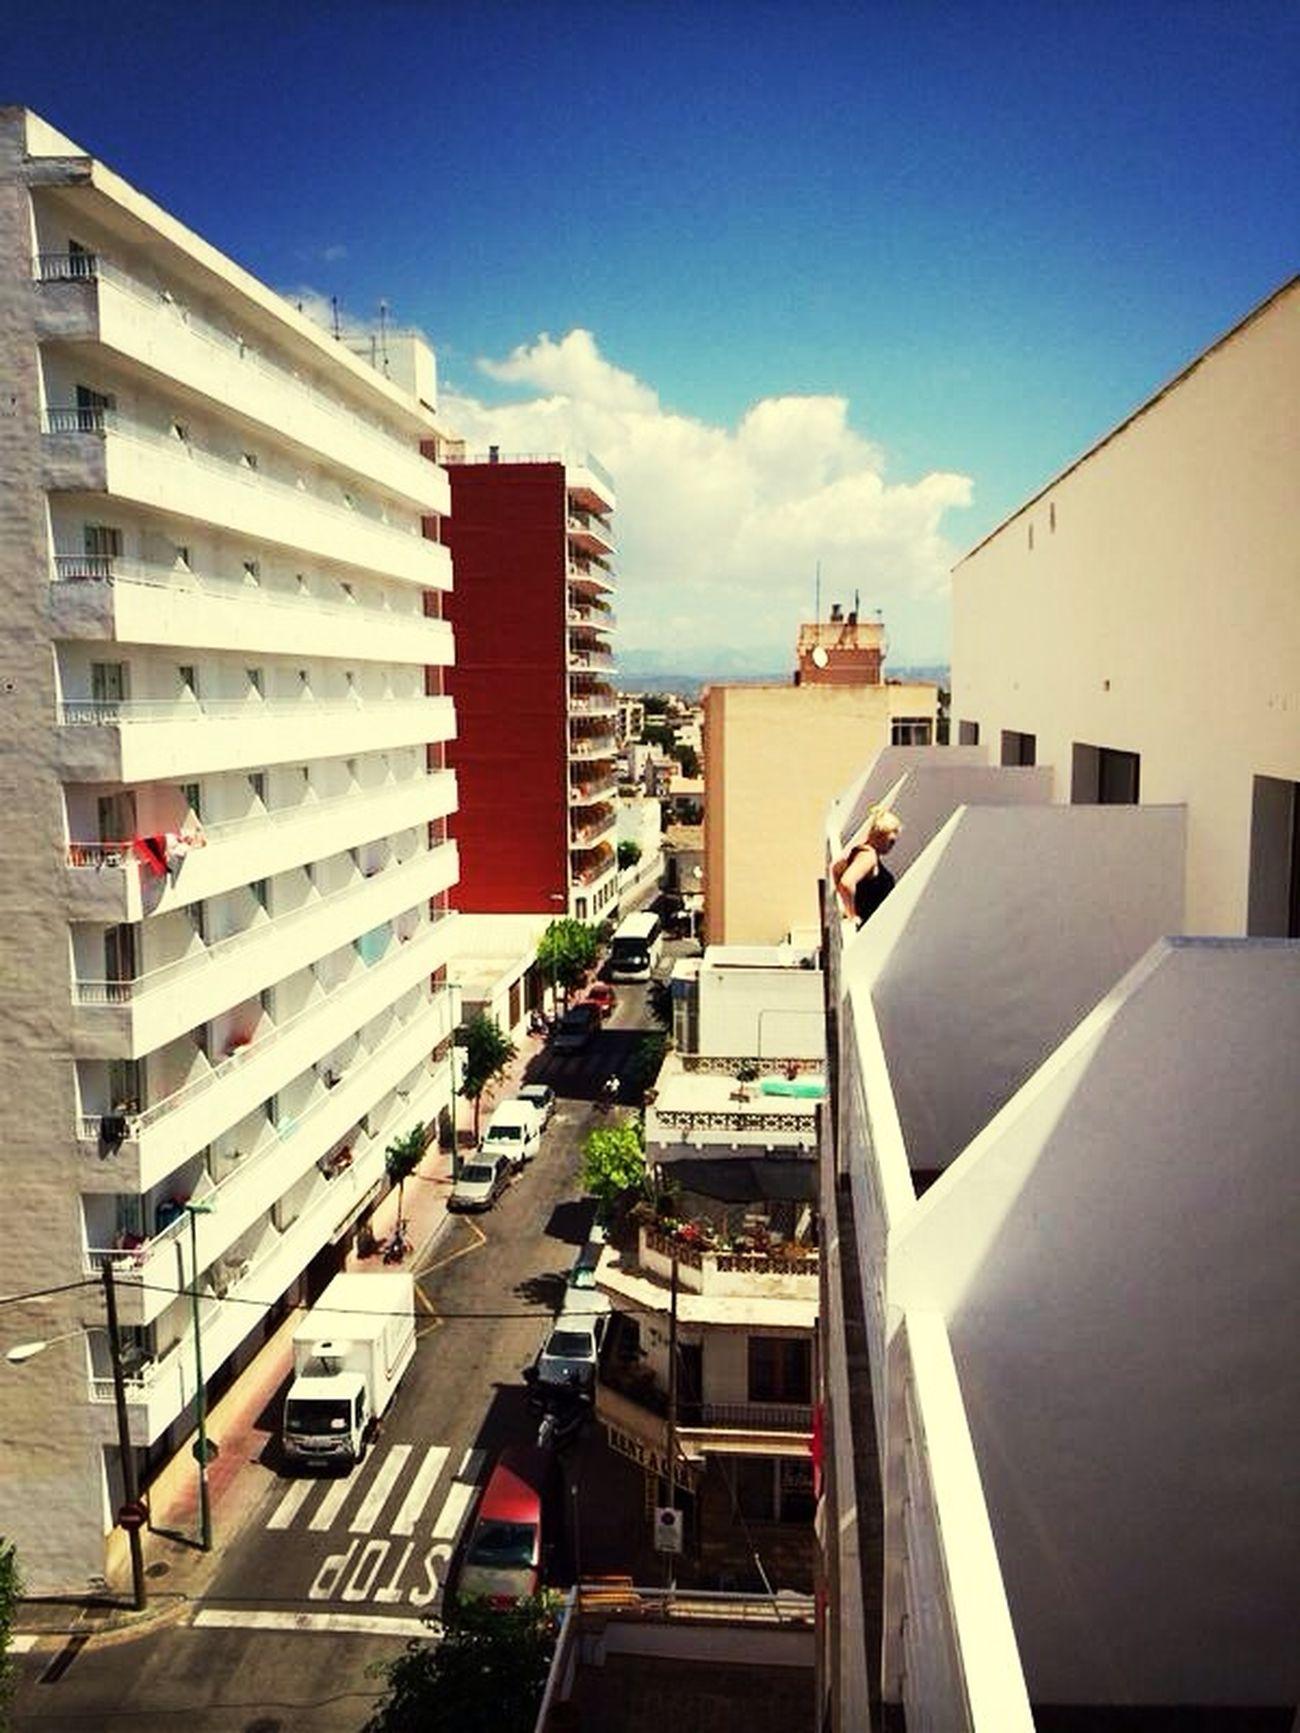 Where Do You Swarm? Just Mallorca !! ?